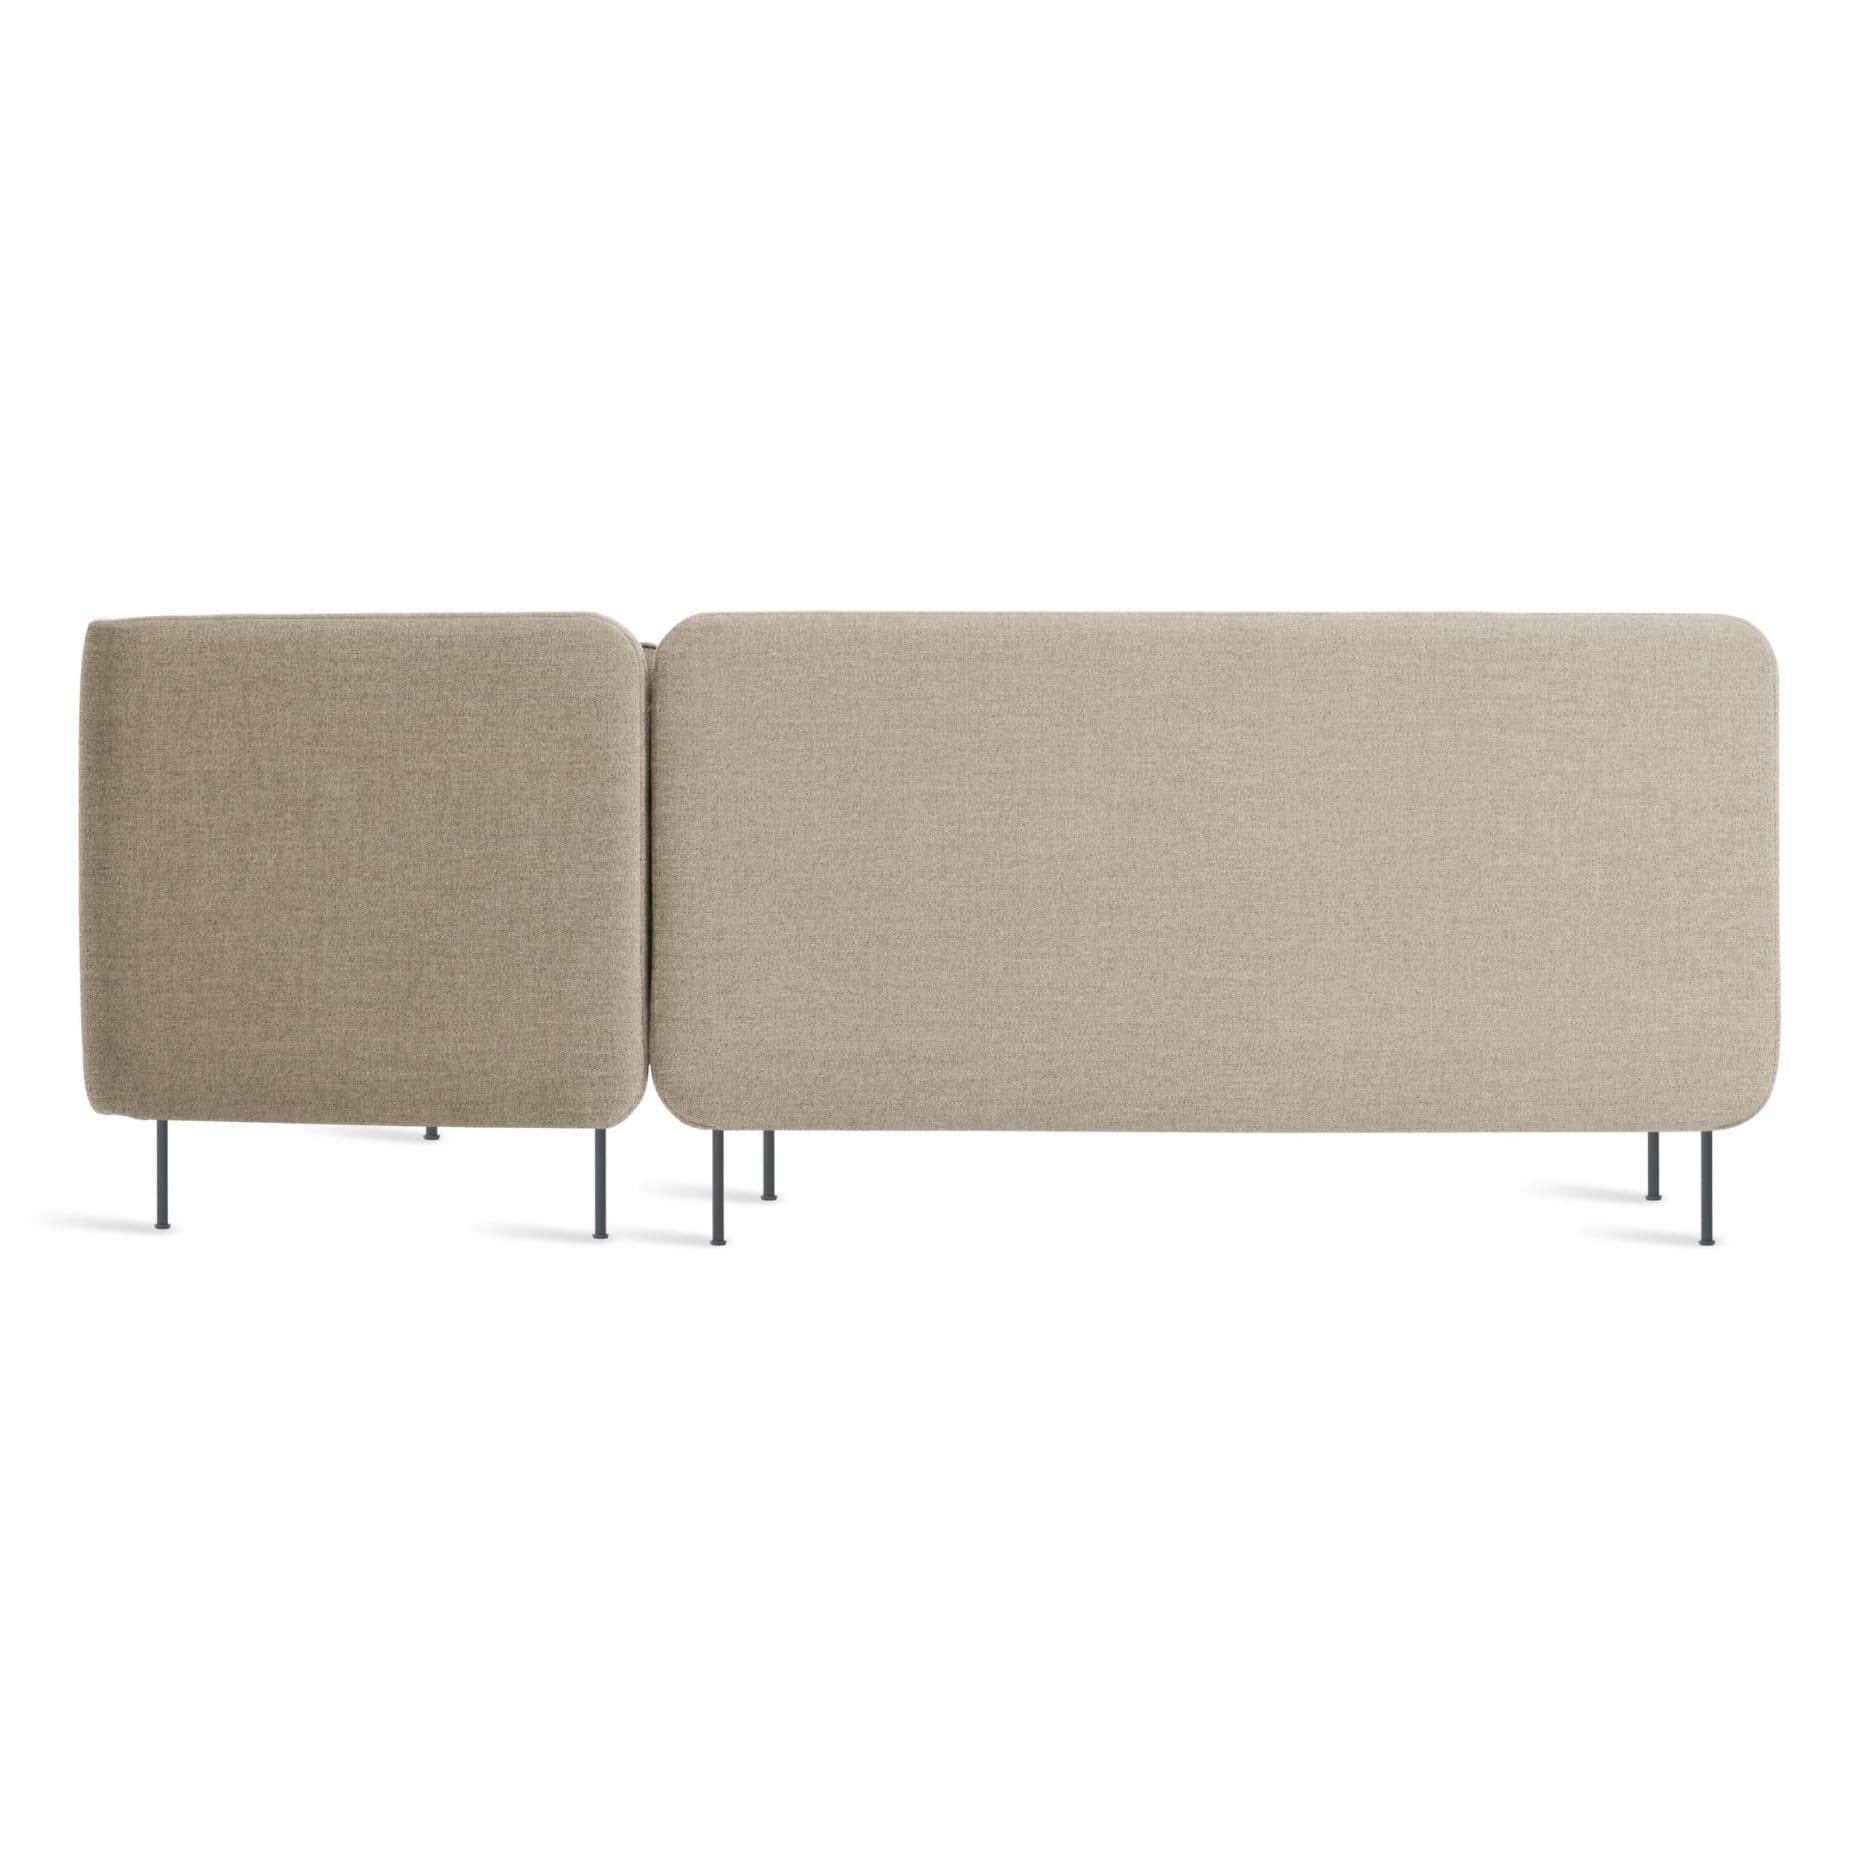 bl1 rchnam st back bloke armless sofa w right chaise tait stone